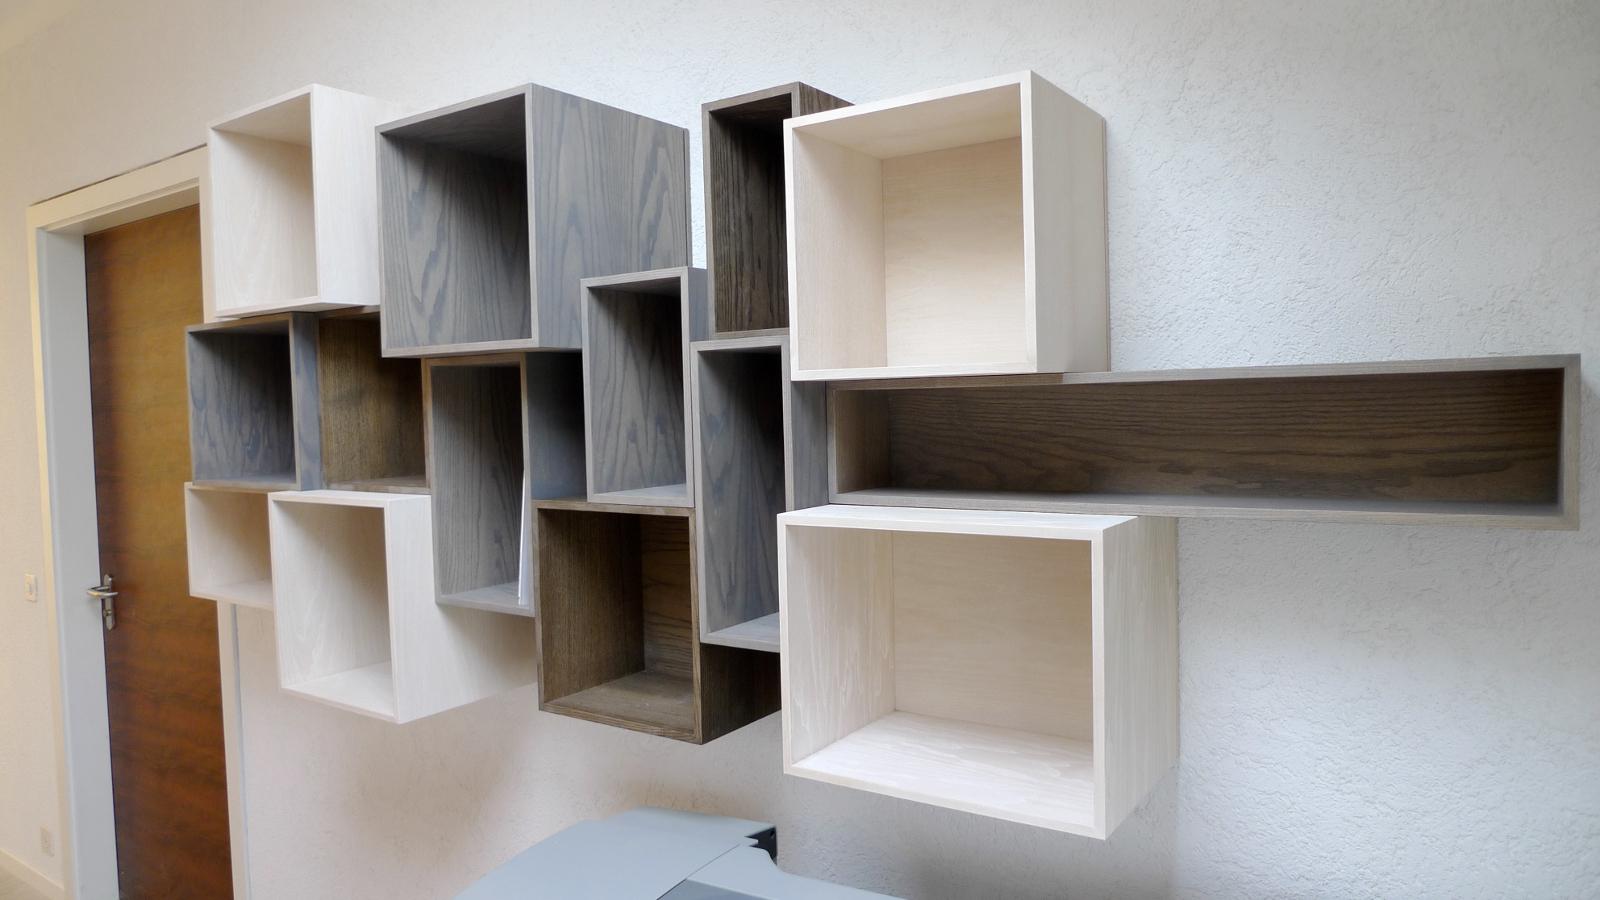 biblioth que modulaire suspendue meyer suter menuiserie. Black Bedroom Furniture Sets. Home Design Ideas